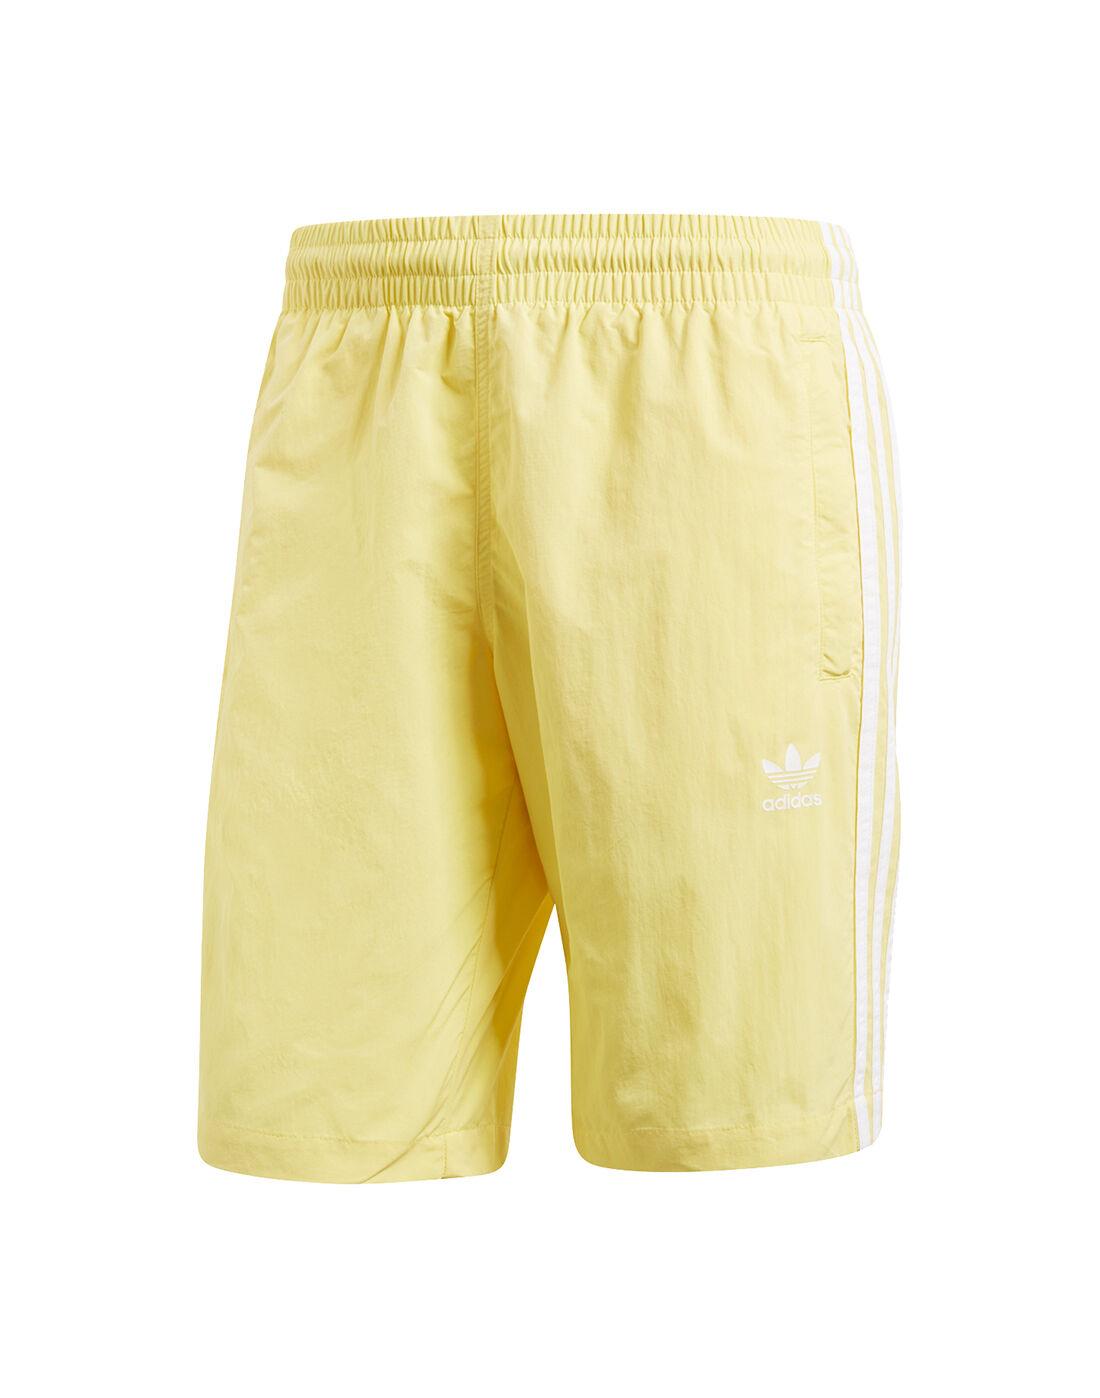 Men's adidas Originals Yellow Swim Shorts | Life Style Sports